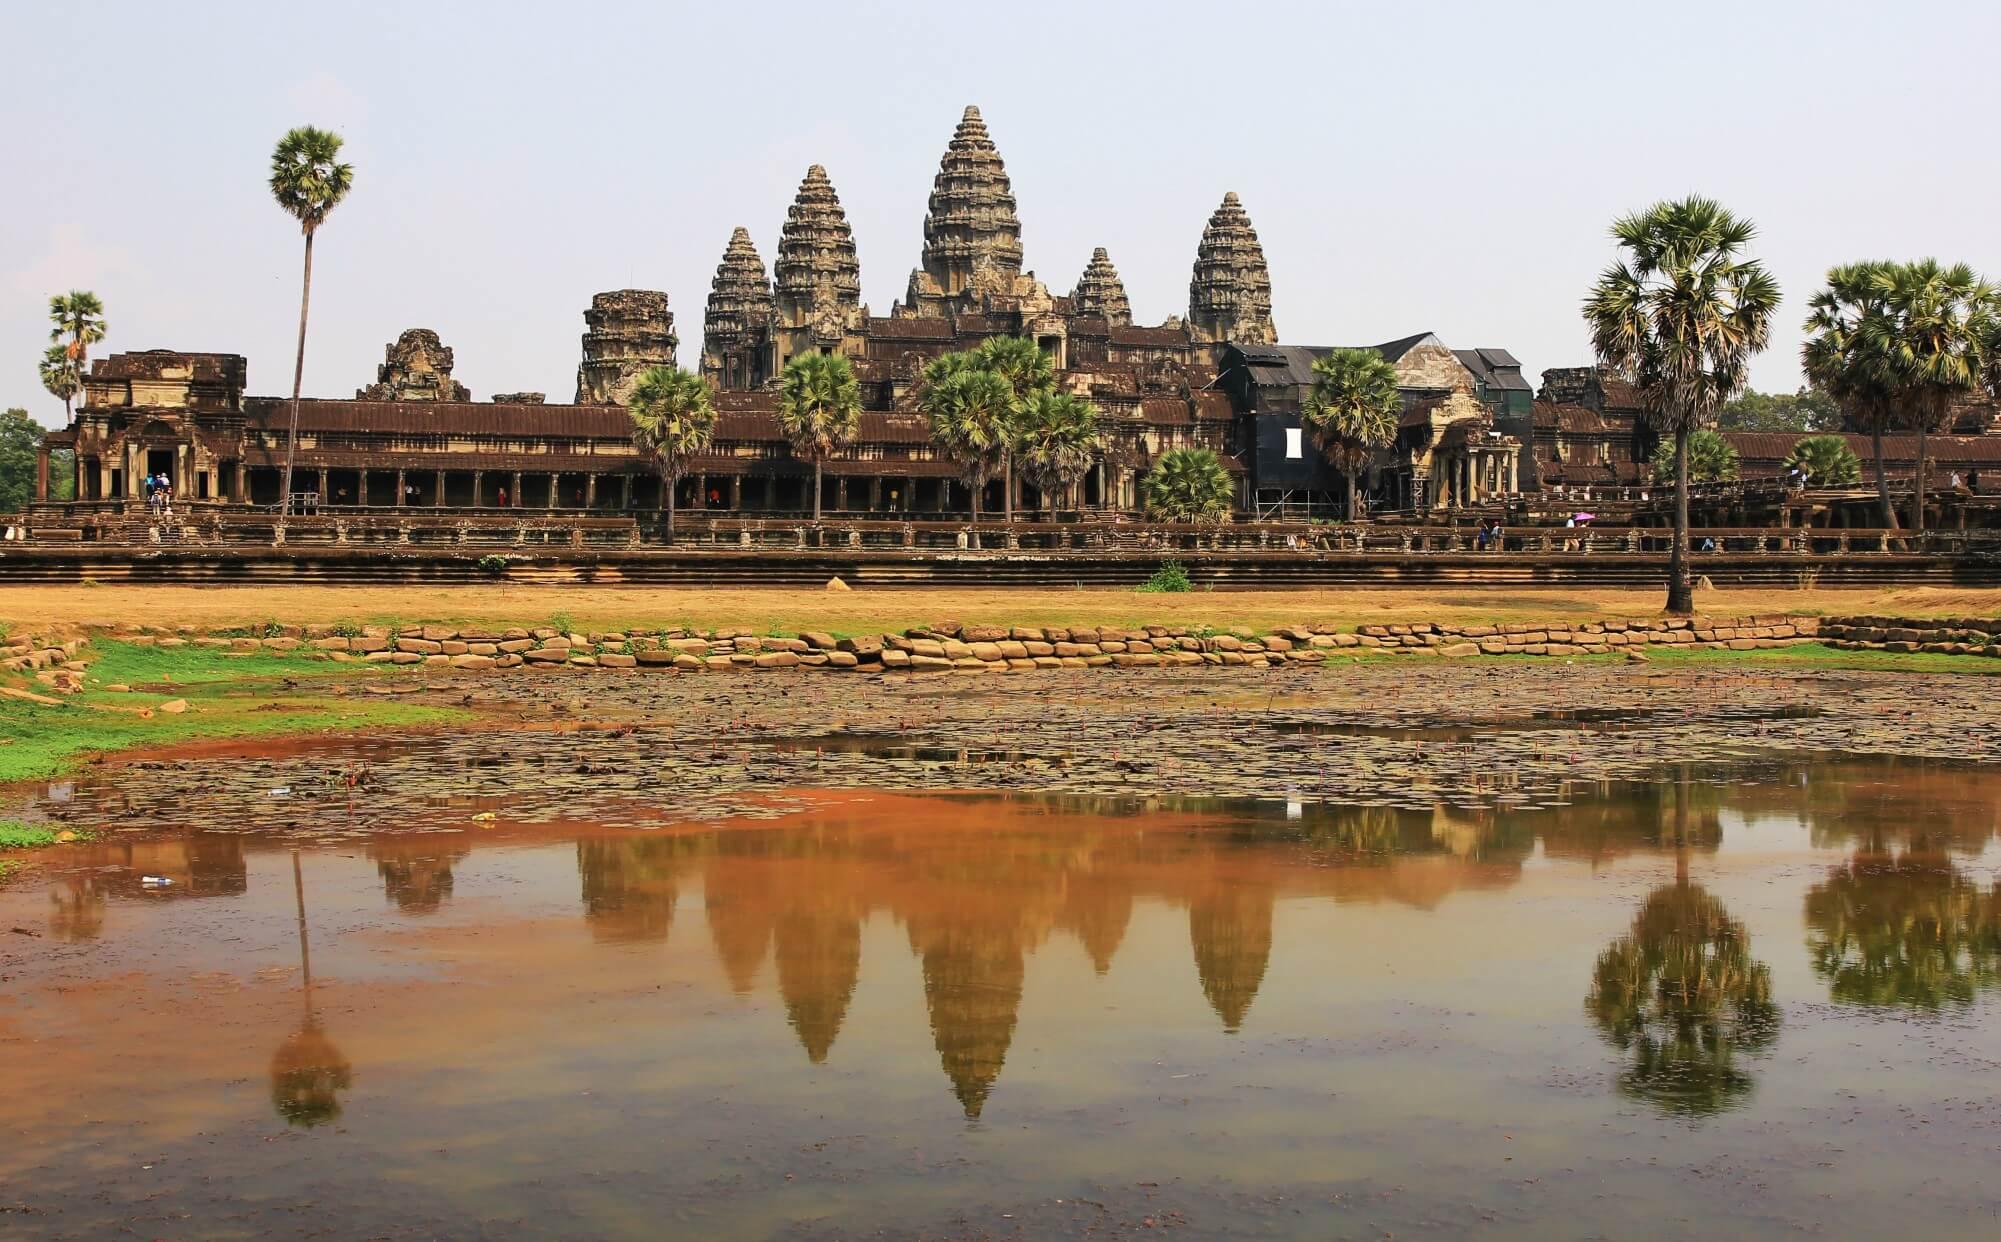 panorama sur le temple Angkor wat